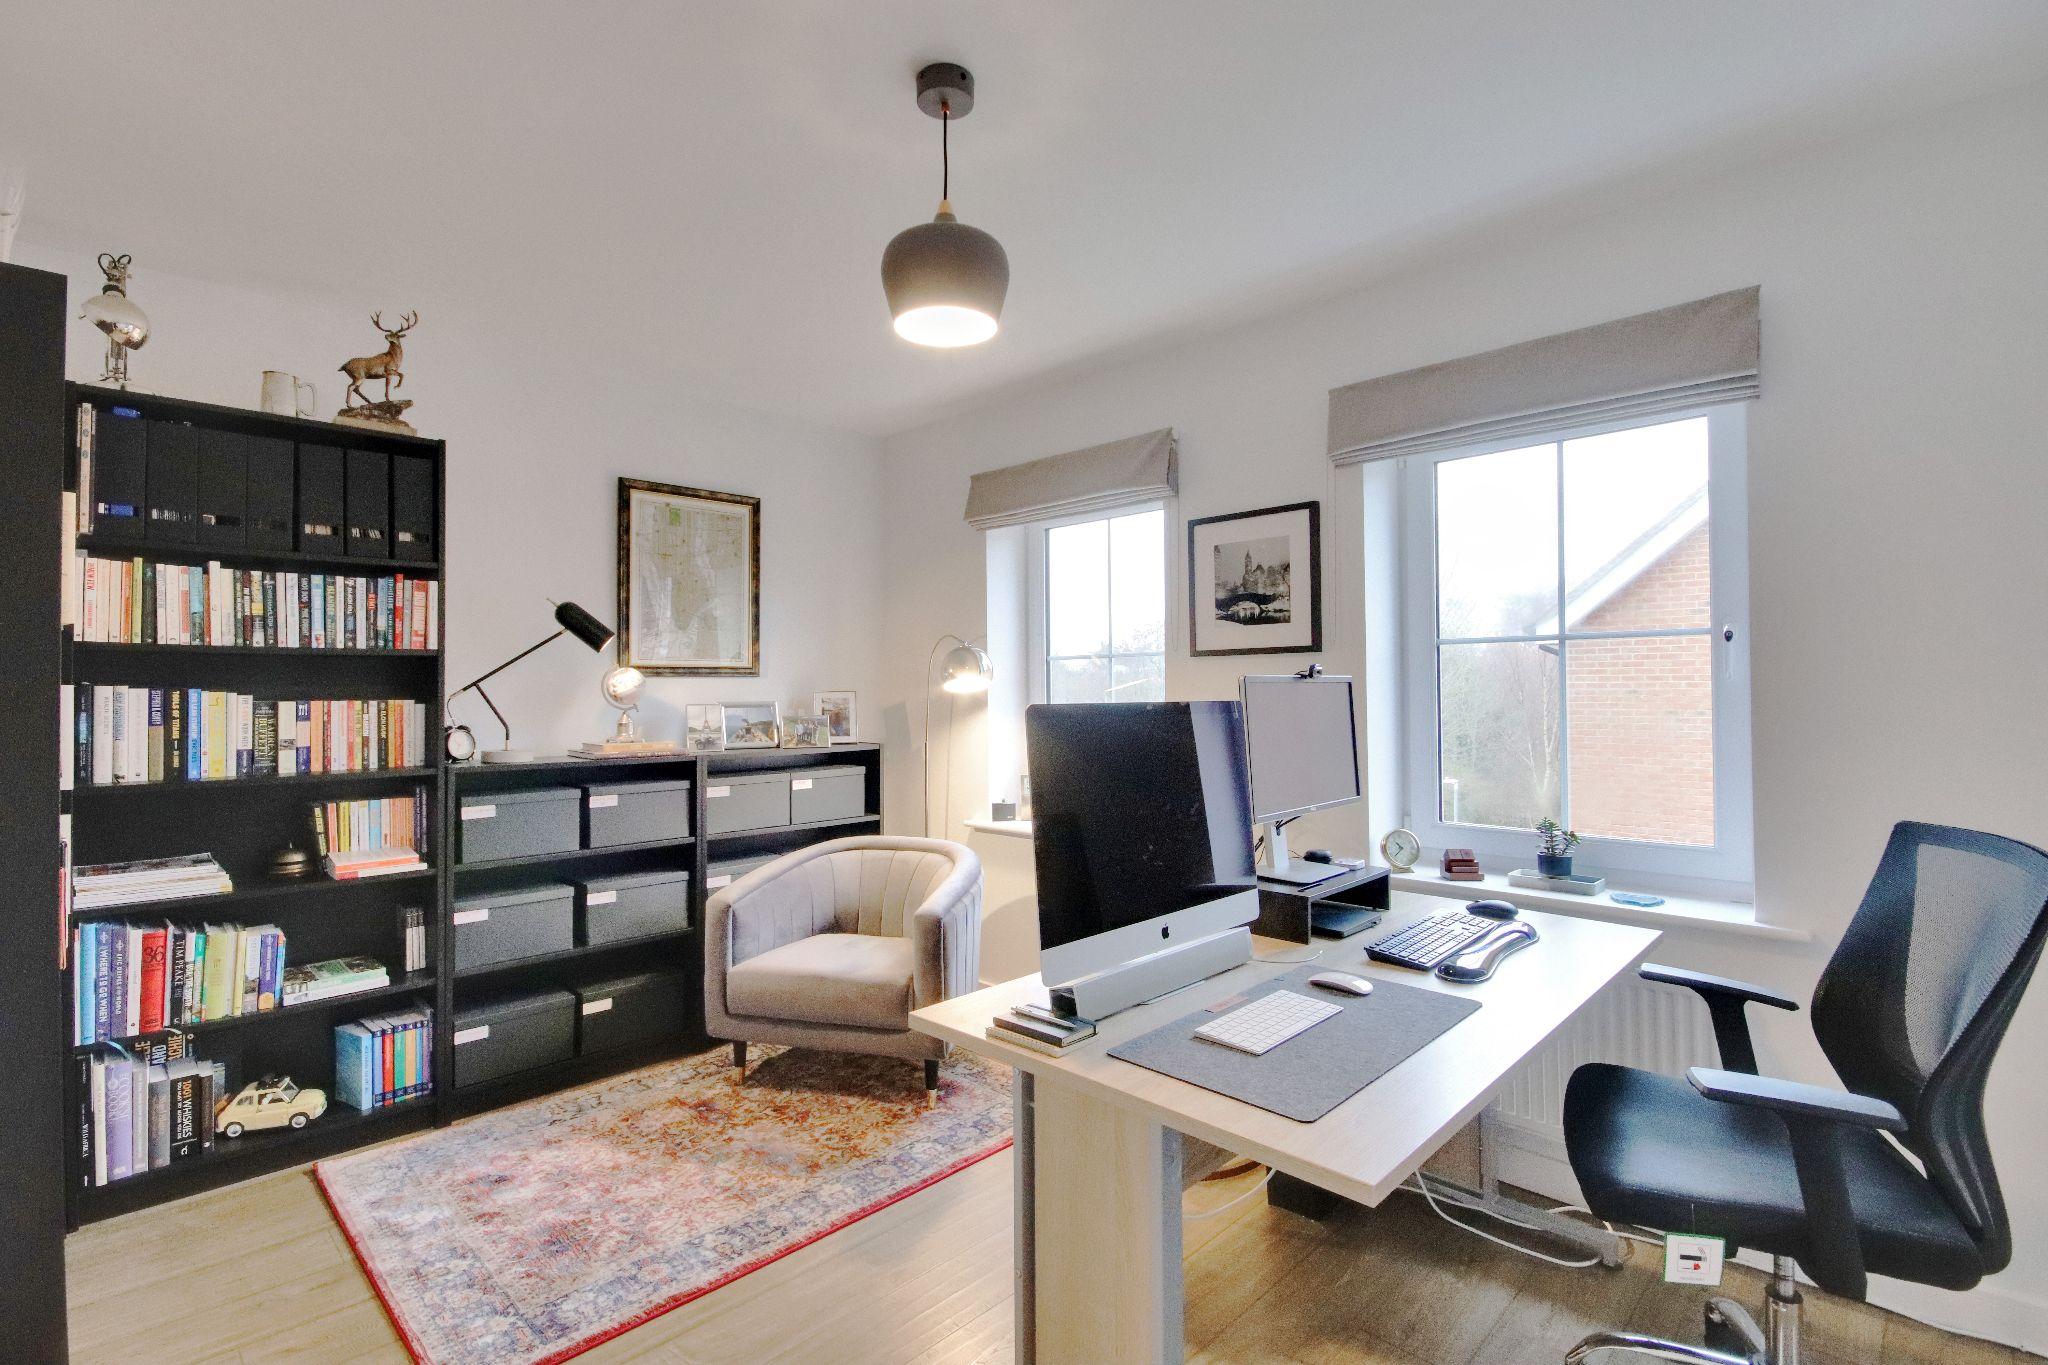 3 bedroom mid terraced house Sold in Sevenoaks - Photograph 9